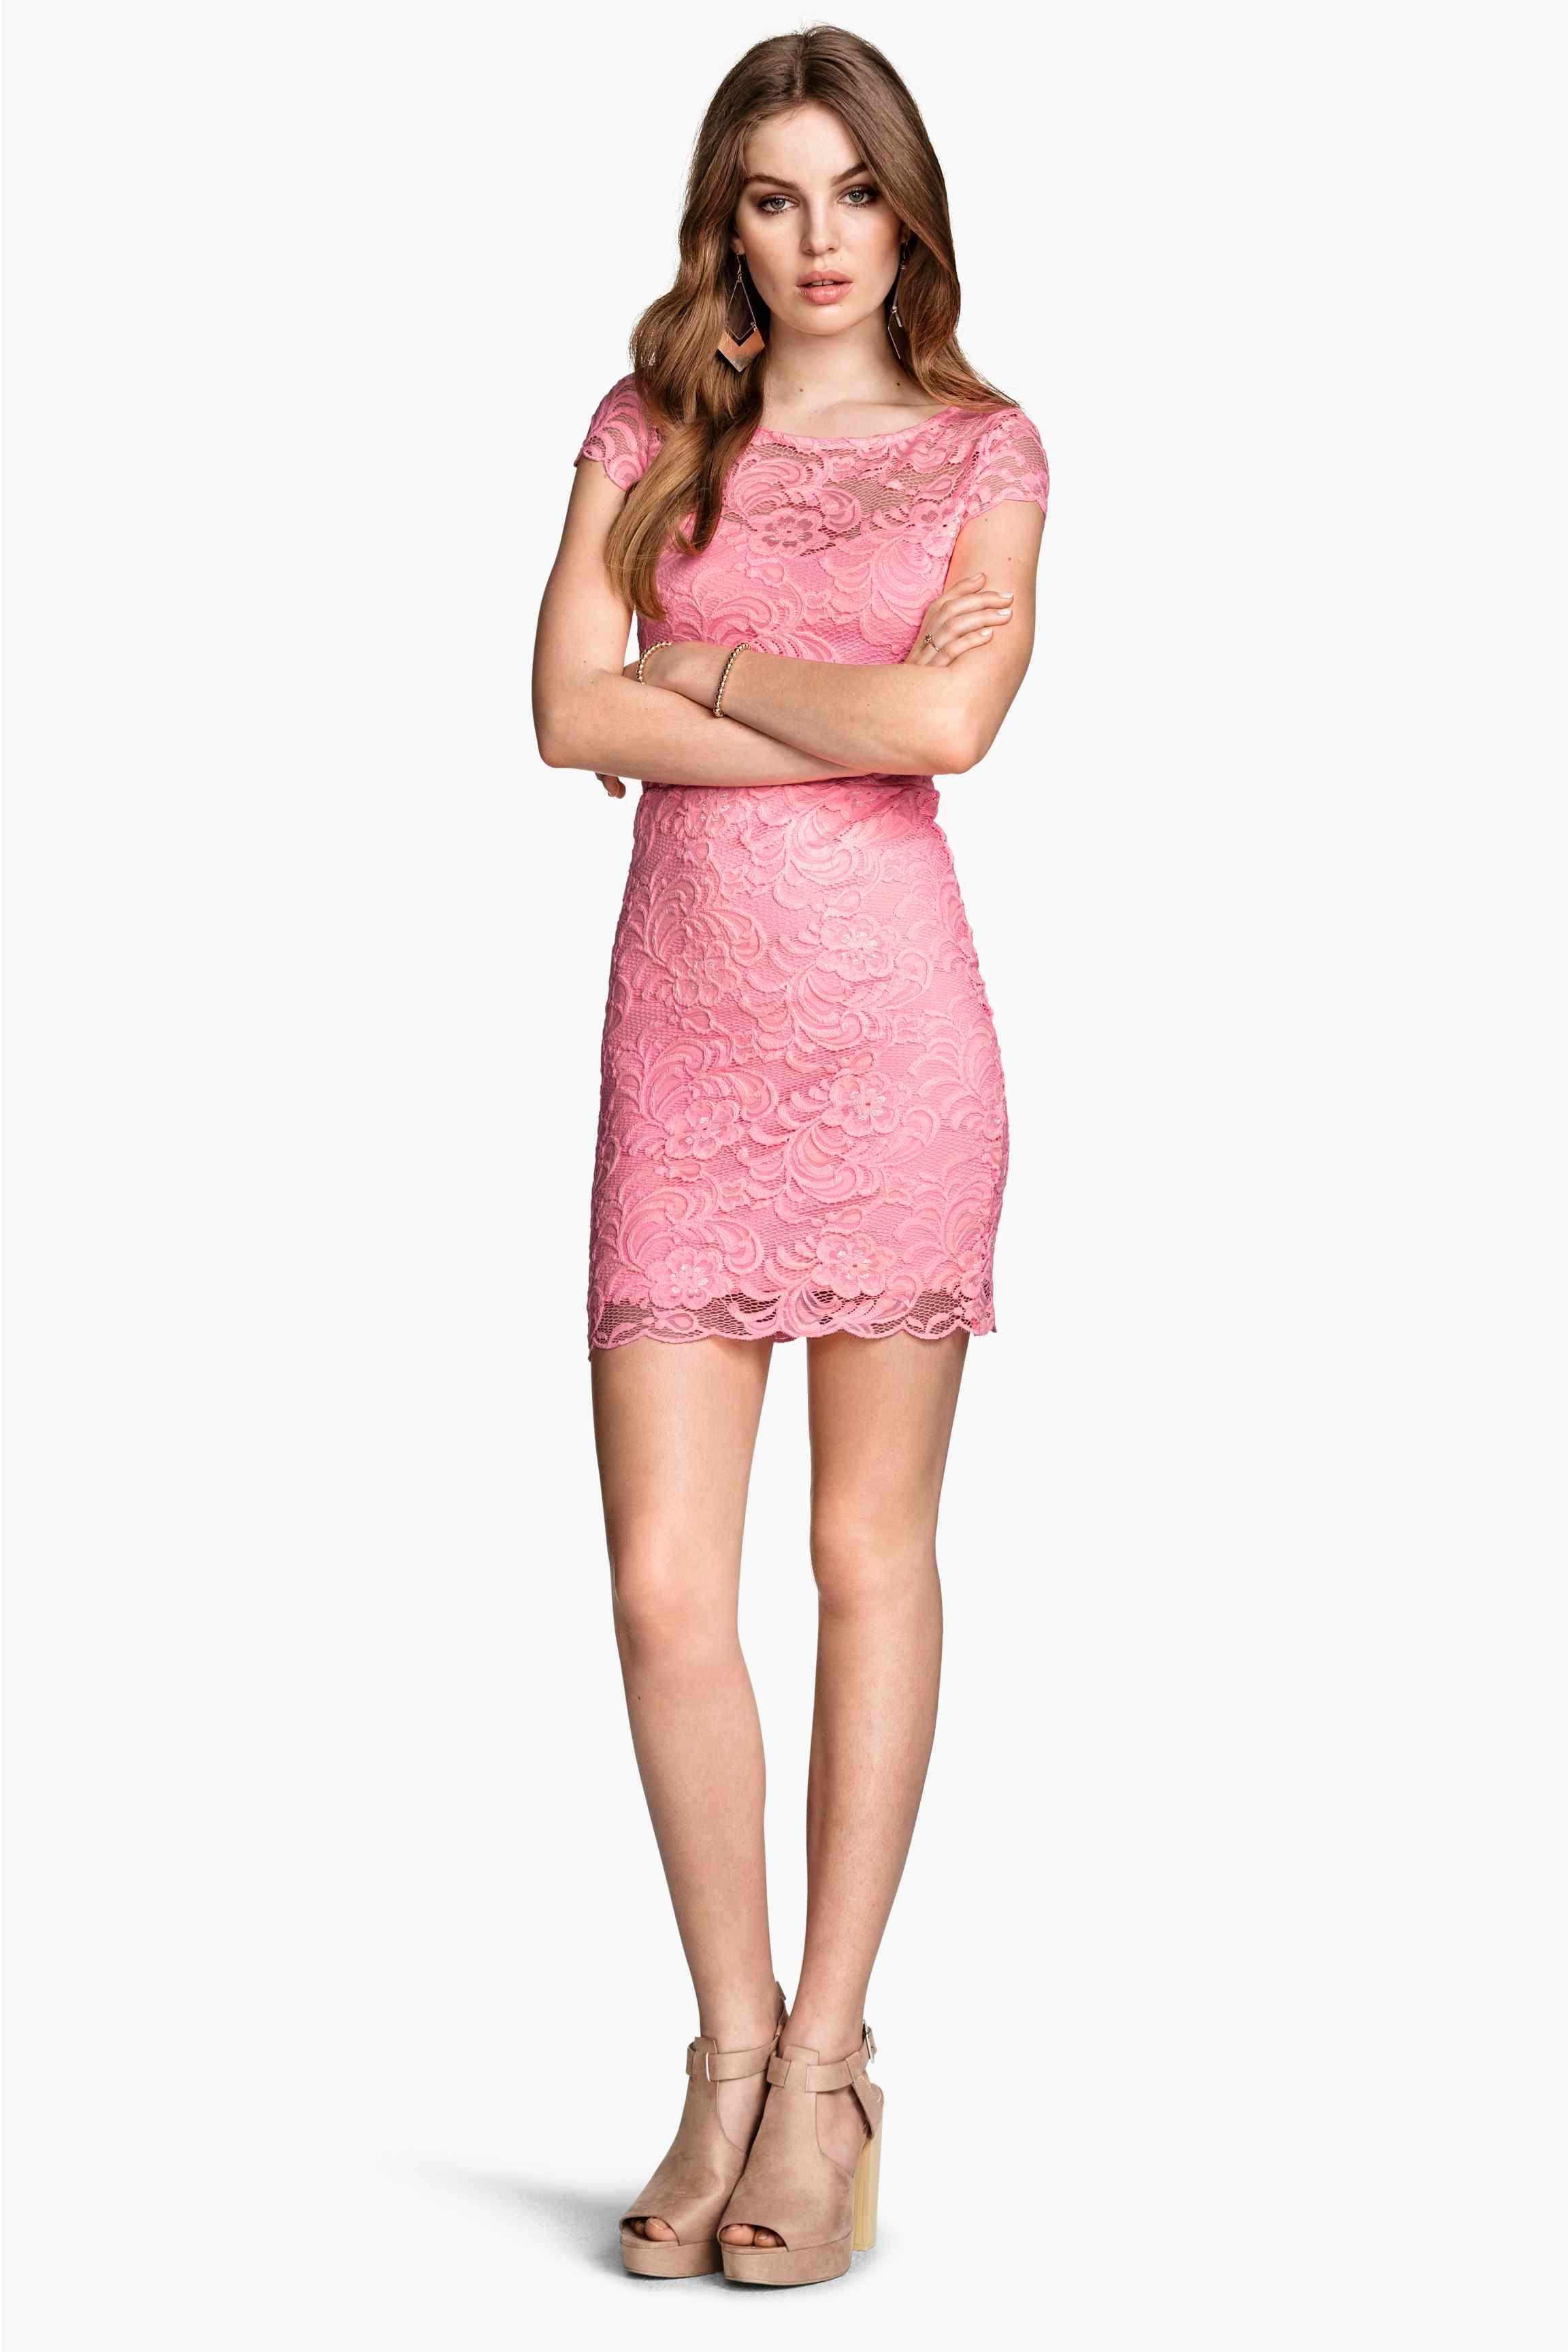 Vestido de encaje | H&M | My Style | Pinterest | Vestidos de encaje ...